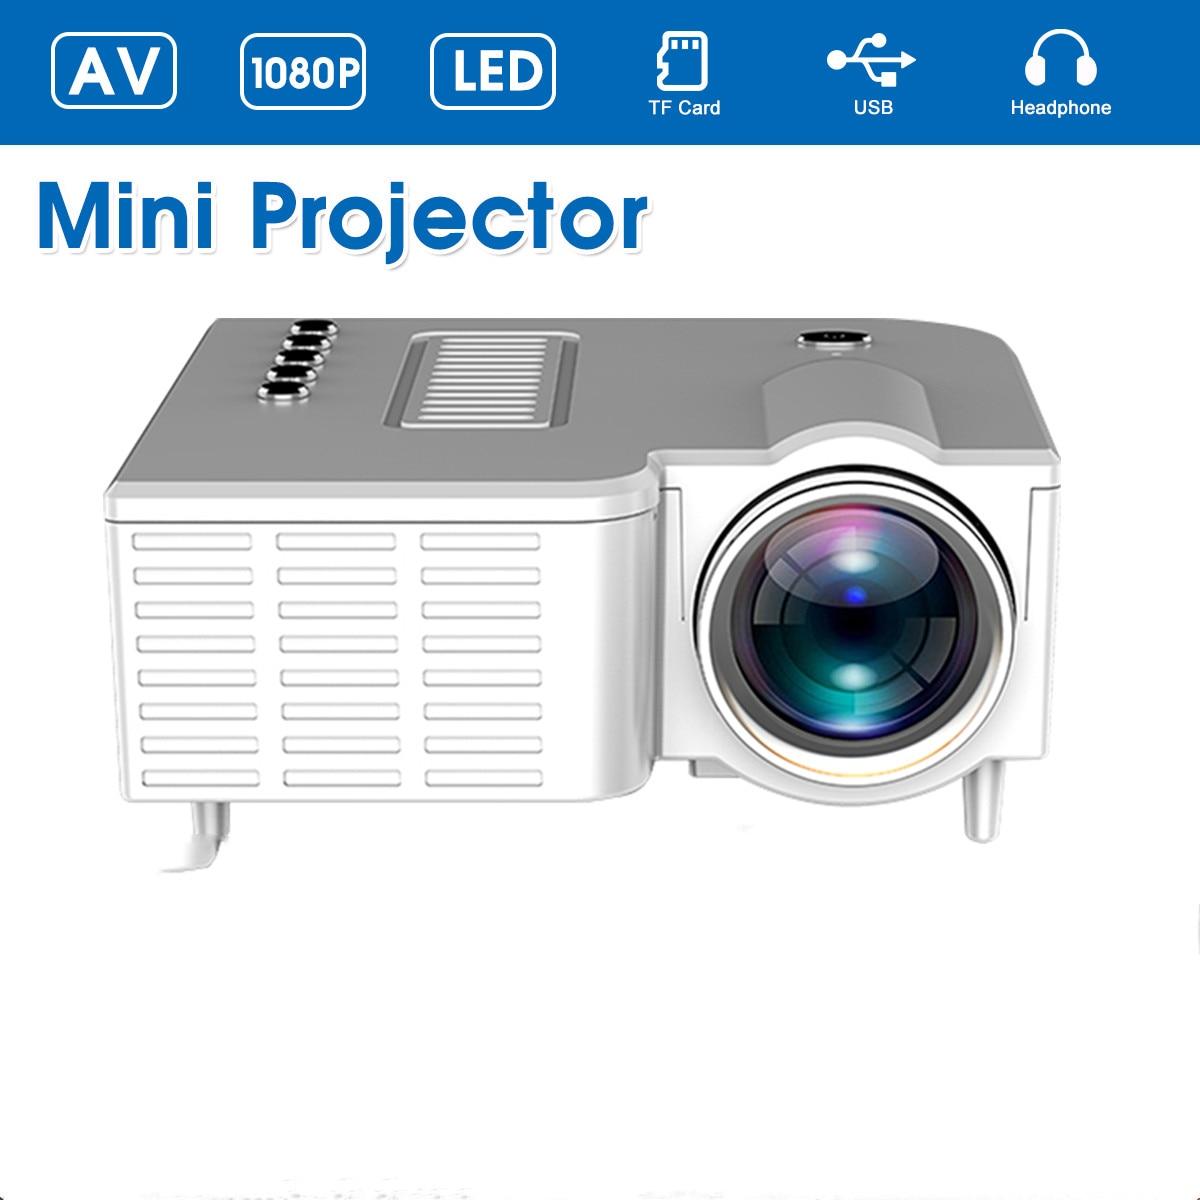 Tragbare LED-Mini-Projektor Video Beamer für Heimkino 500 Lumen Unterstützung HD Display 4k projektor 4K led projektor 1920x1080